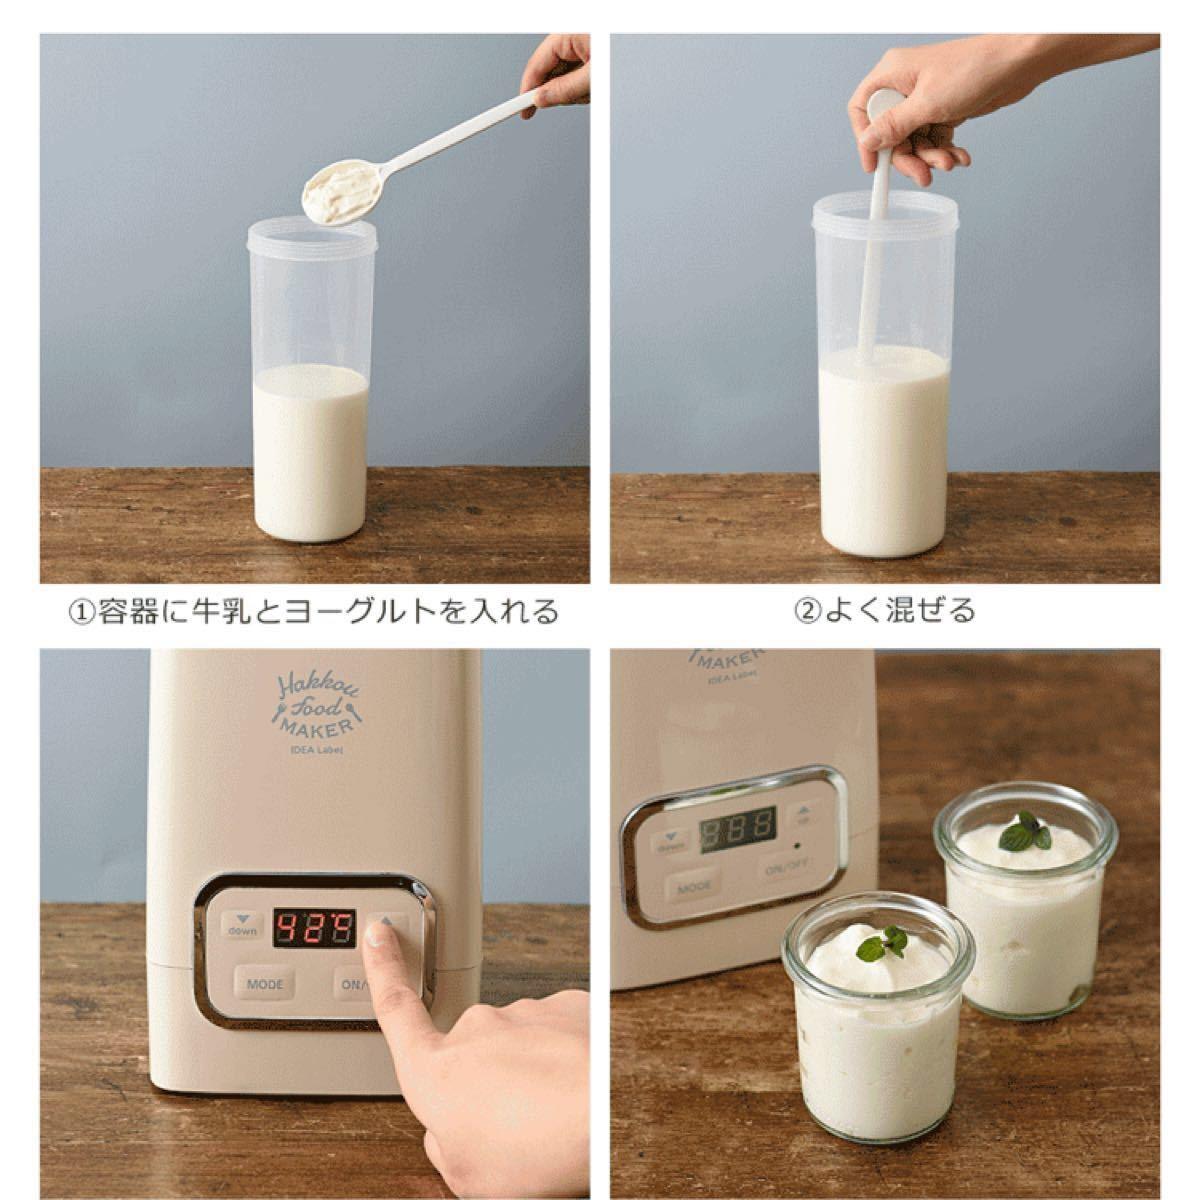 ☆IDEA LABEL ブルーノ 発酵フードメーカー レッド☆